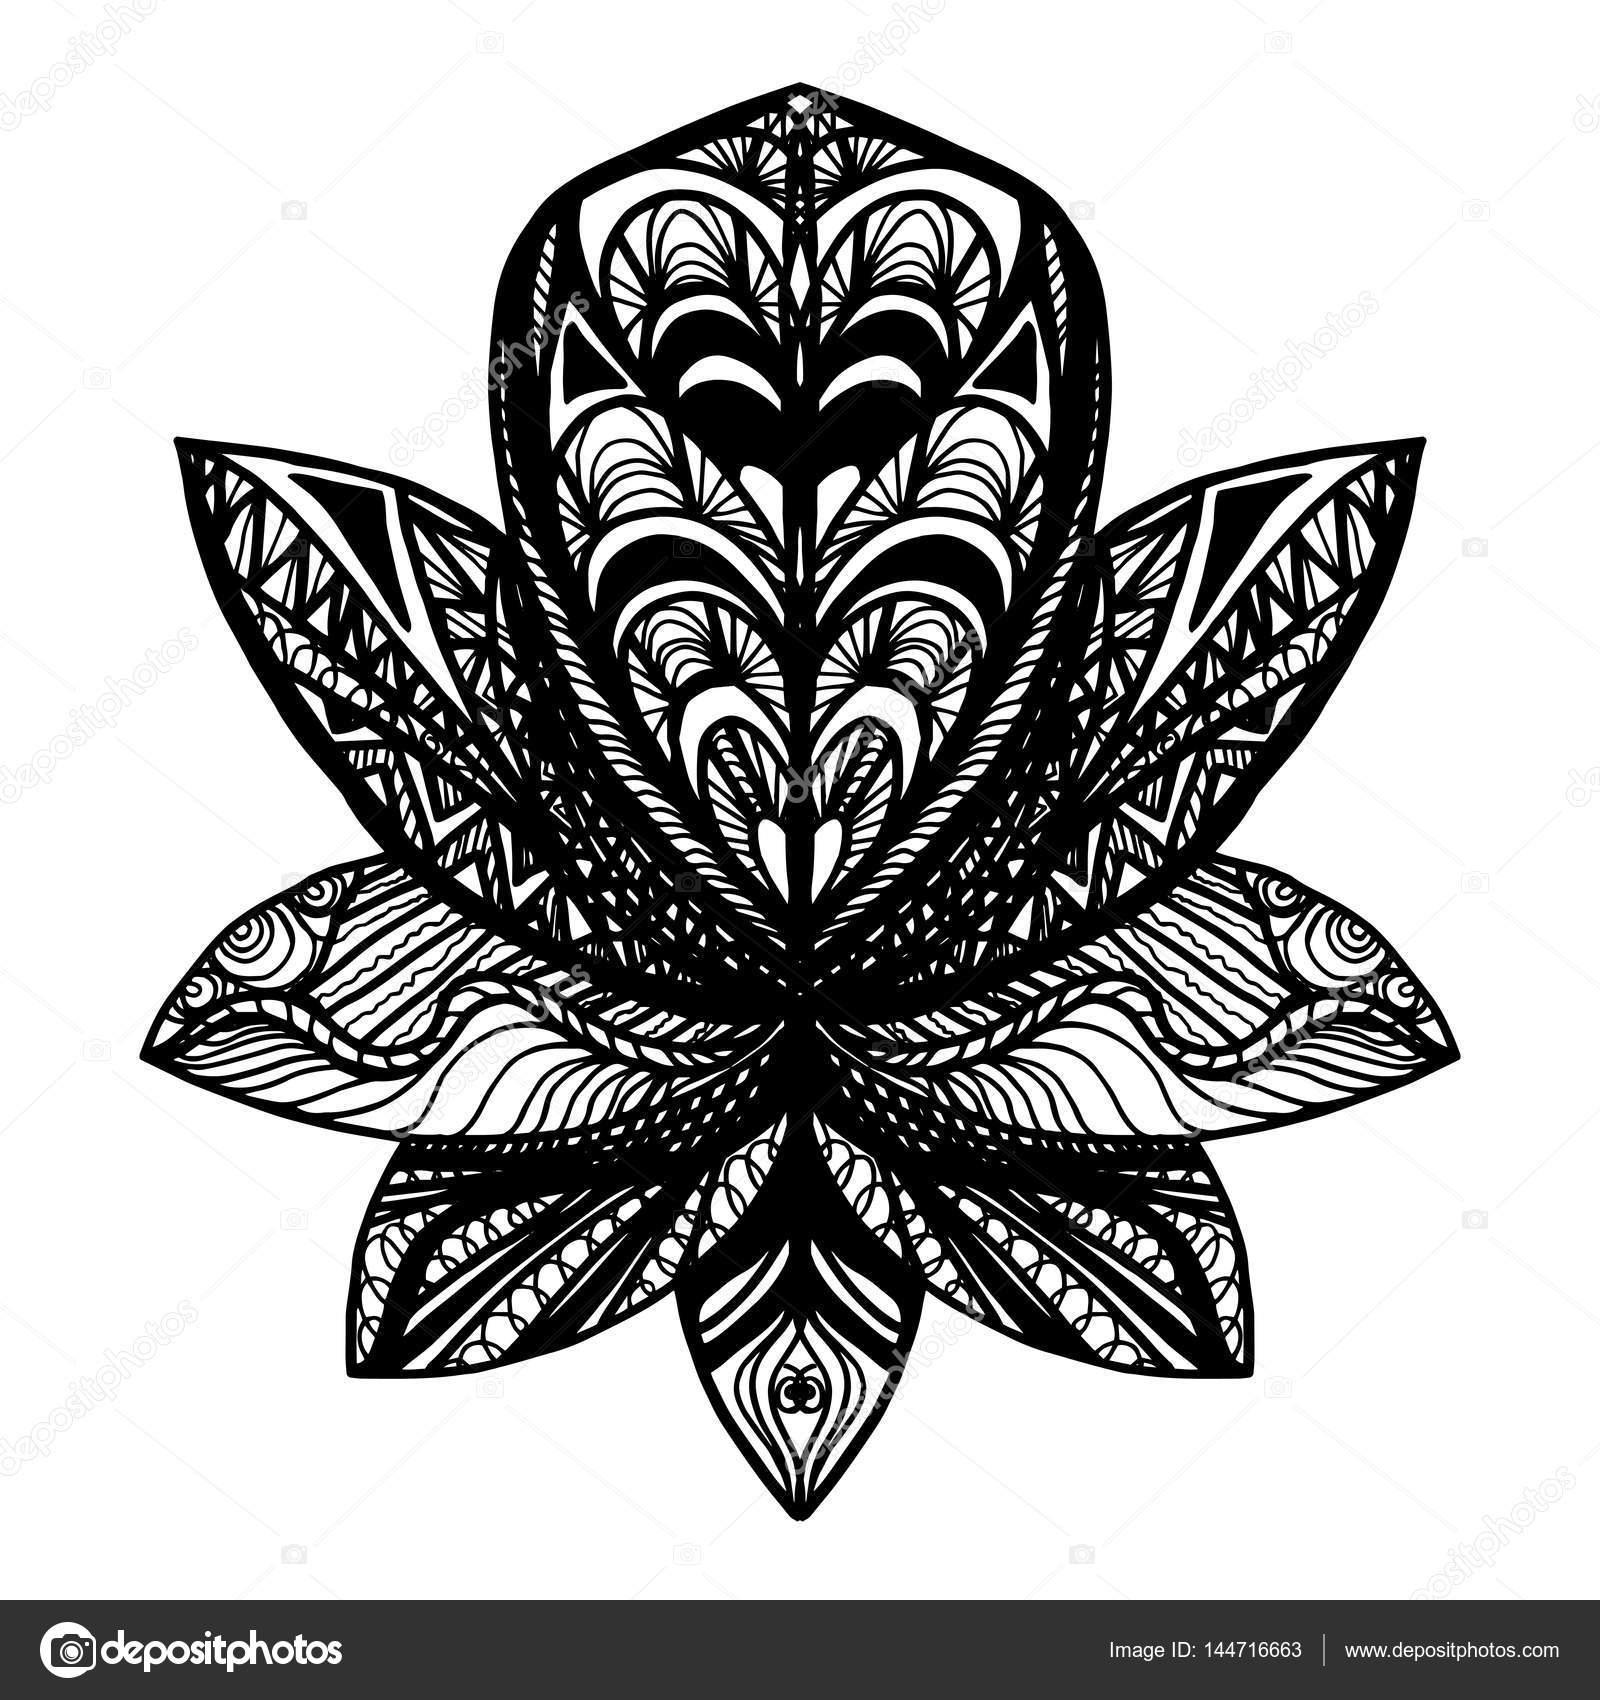 Flower lotus tattoo stock vector barsrsind 144716663 flower lotus magic symbol for print tattoo coloring bookfabric t shirt cloth in boho style tribal lotus design vector vector by barsrsind izmirmasajfo